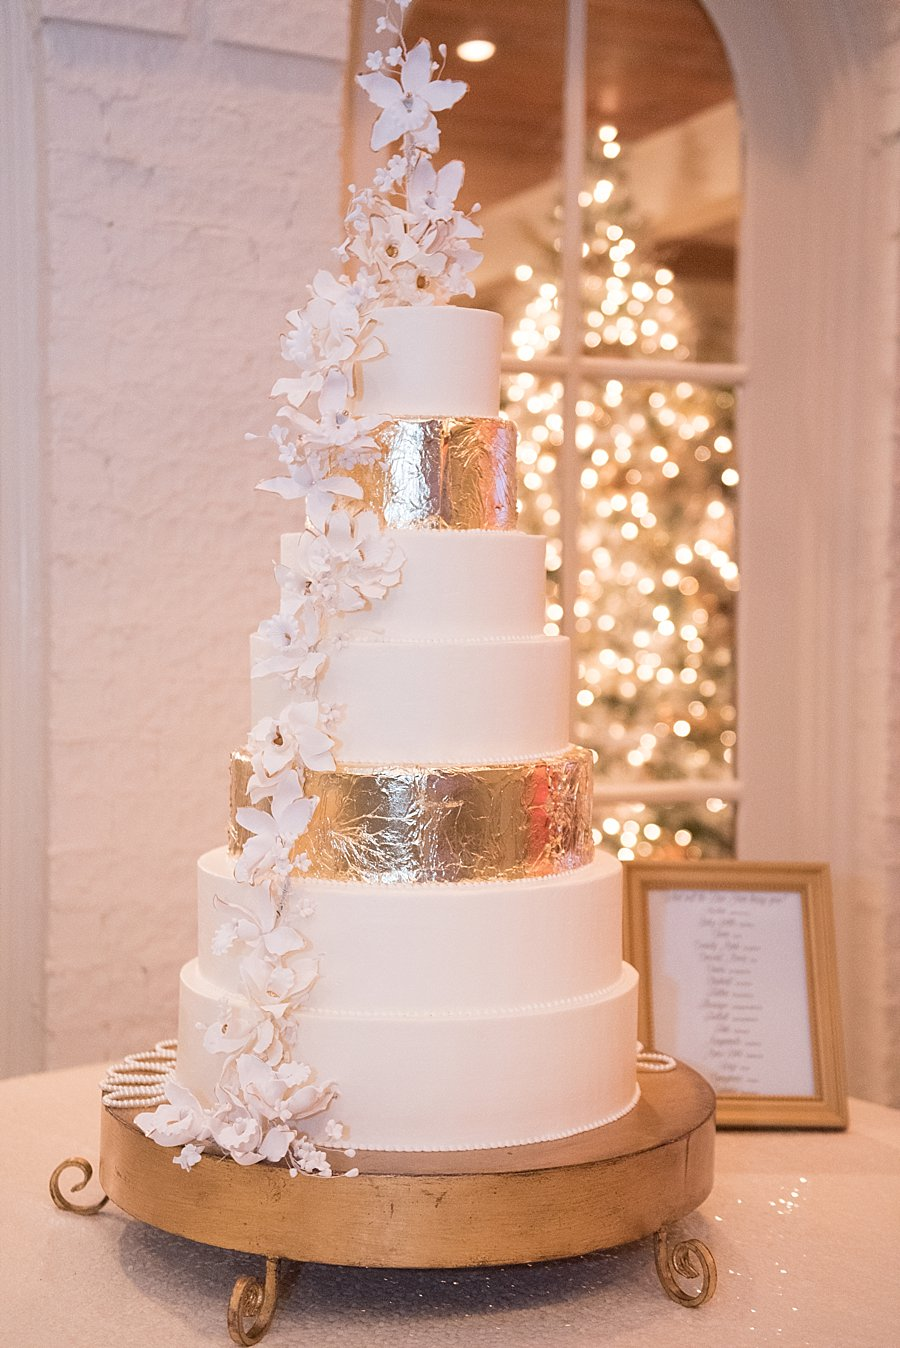 La Louisiane Bakery | Gold foil Cake | Classic black and white black-tie wedding at home | Sapphire Events | Jacqueline Dallimore Photo | NYE Wedding | Estate Wedding | Tented Wedding | Monique Lhuillier gown | Blush Wedding dress | New Year's Eve wedding